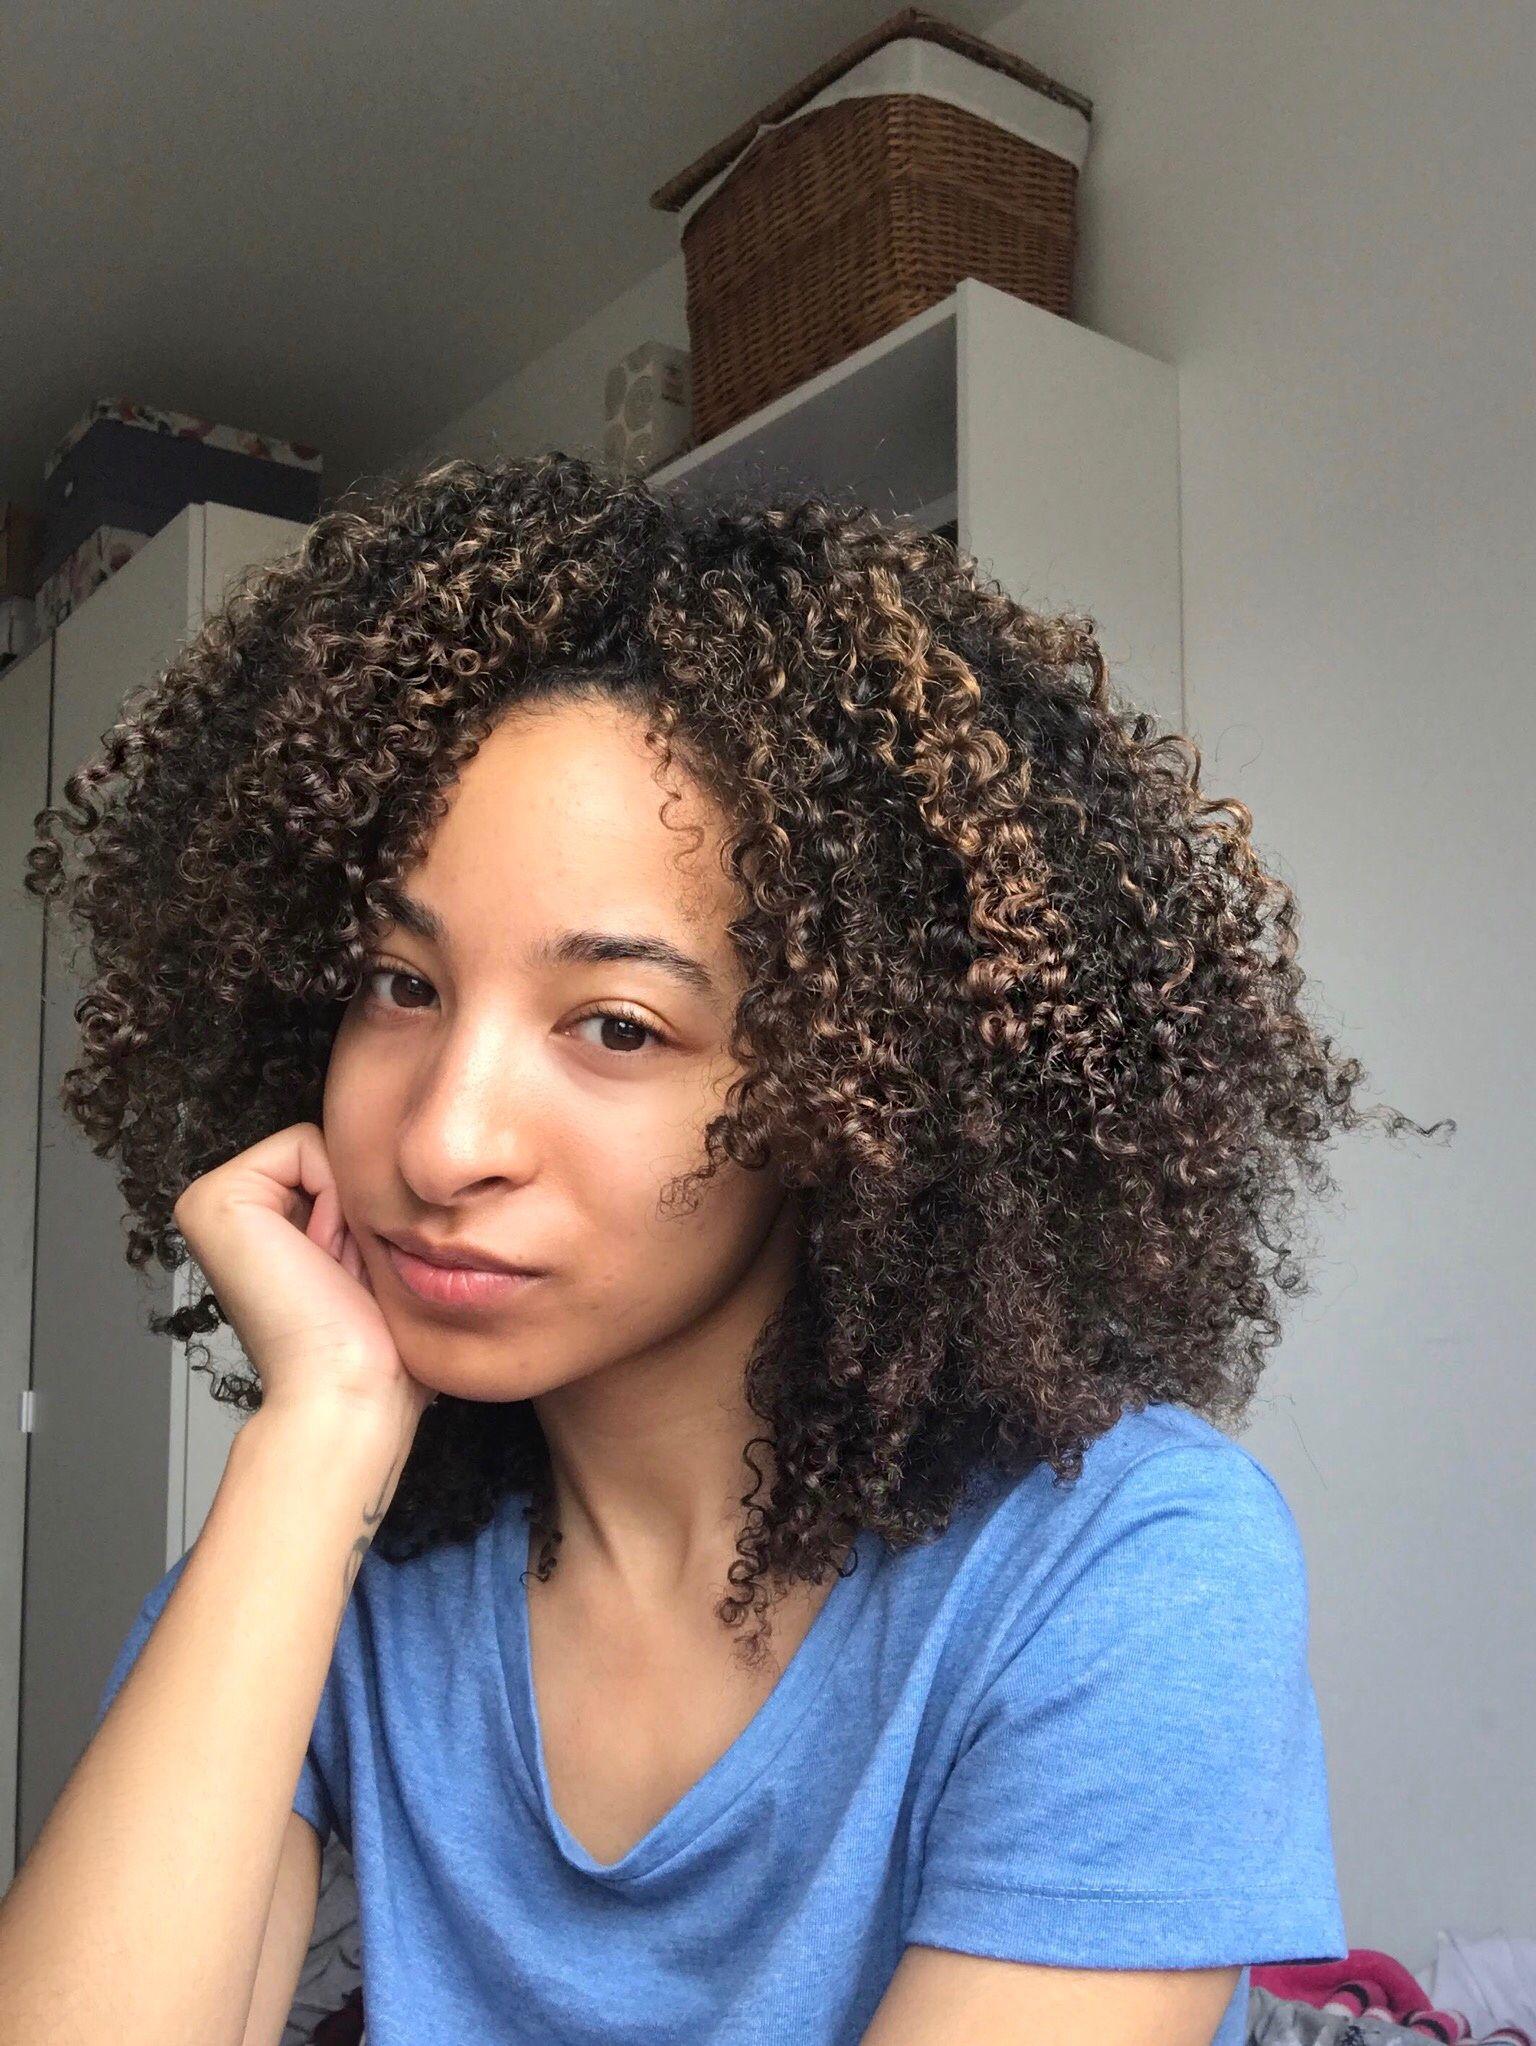 Sureenawilliamsx Naturalhair Curls Transitioning Kinkyhair Blackhair Afrohair Caribbean Afro Hairstyles Natural Hair Styles Hair Inspiration